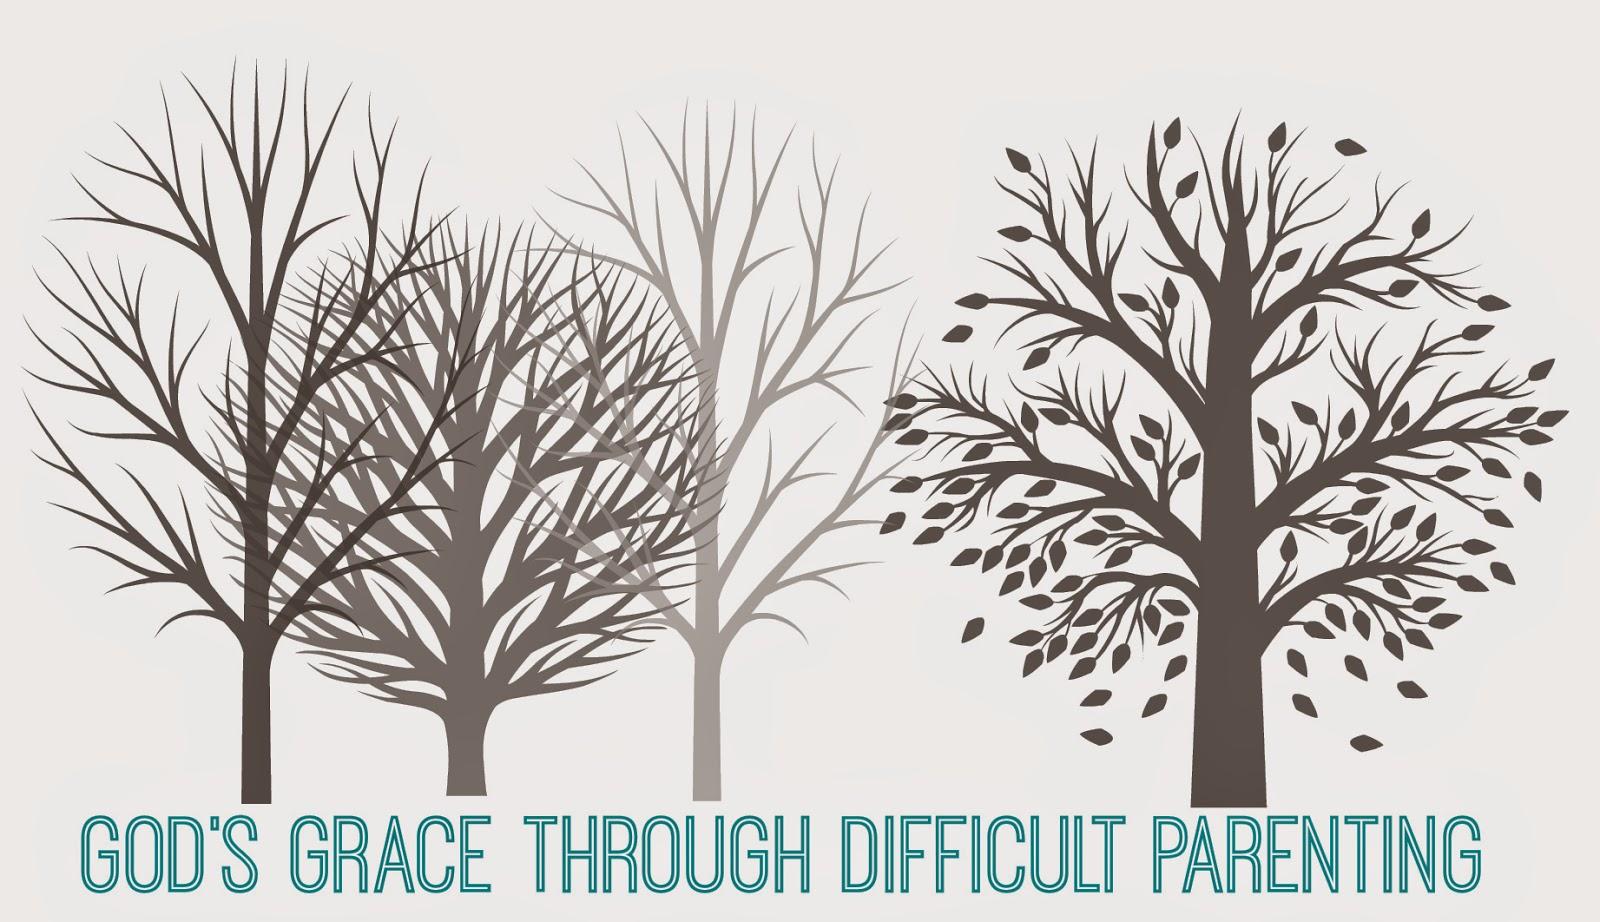 gods grace through difficult parenting, simple on purpose